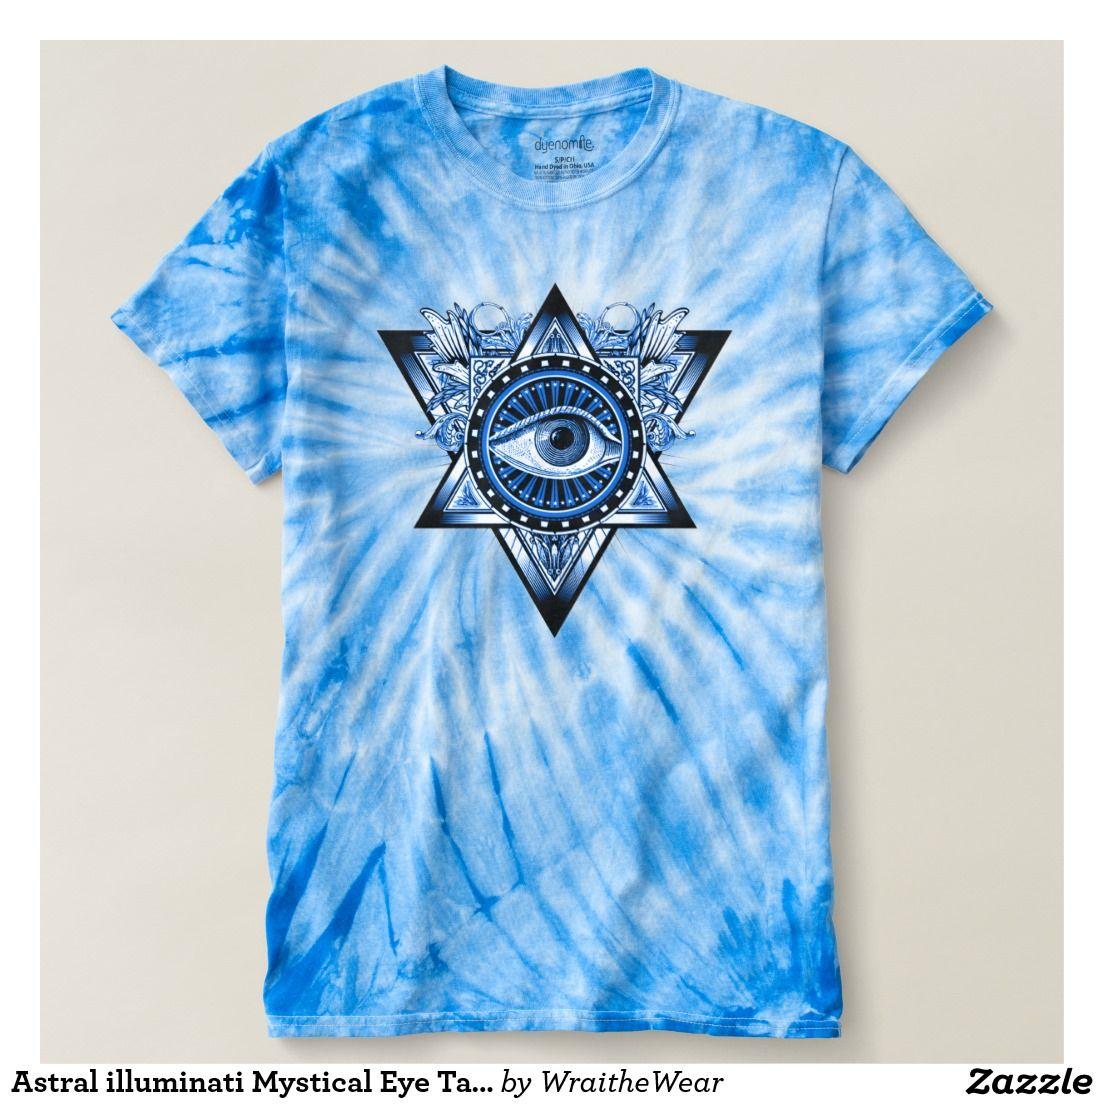 Astral illuminati Mystical Eye Talisman Symbol Tee | Wraithe Wear ...